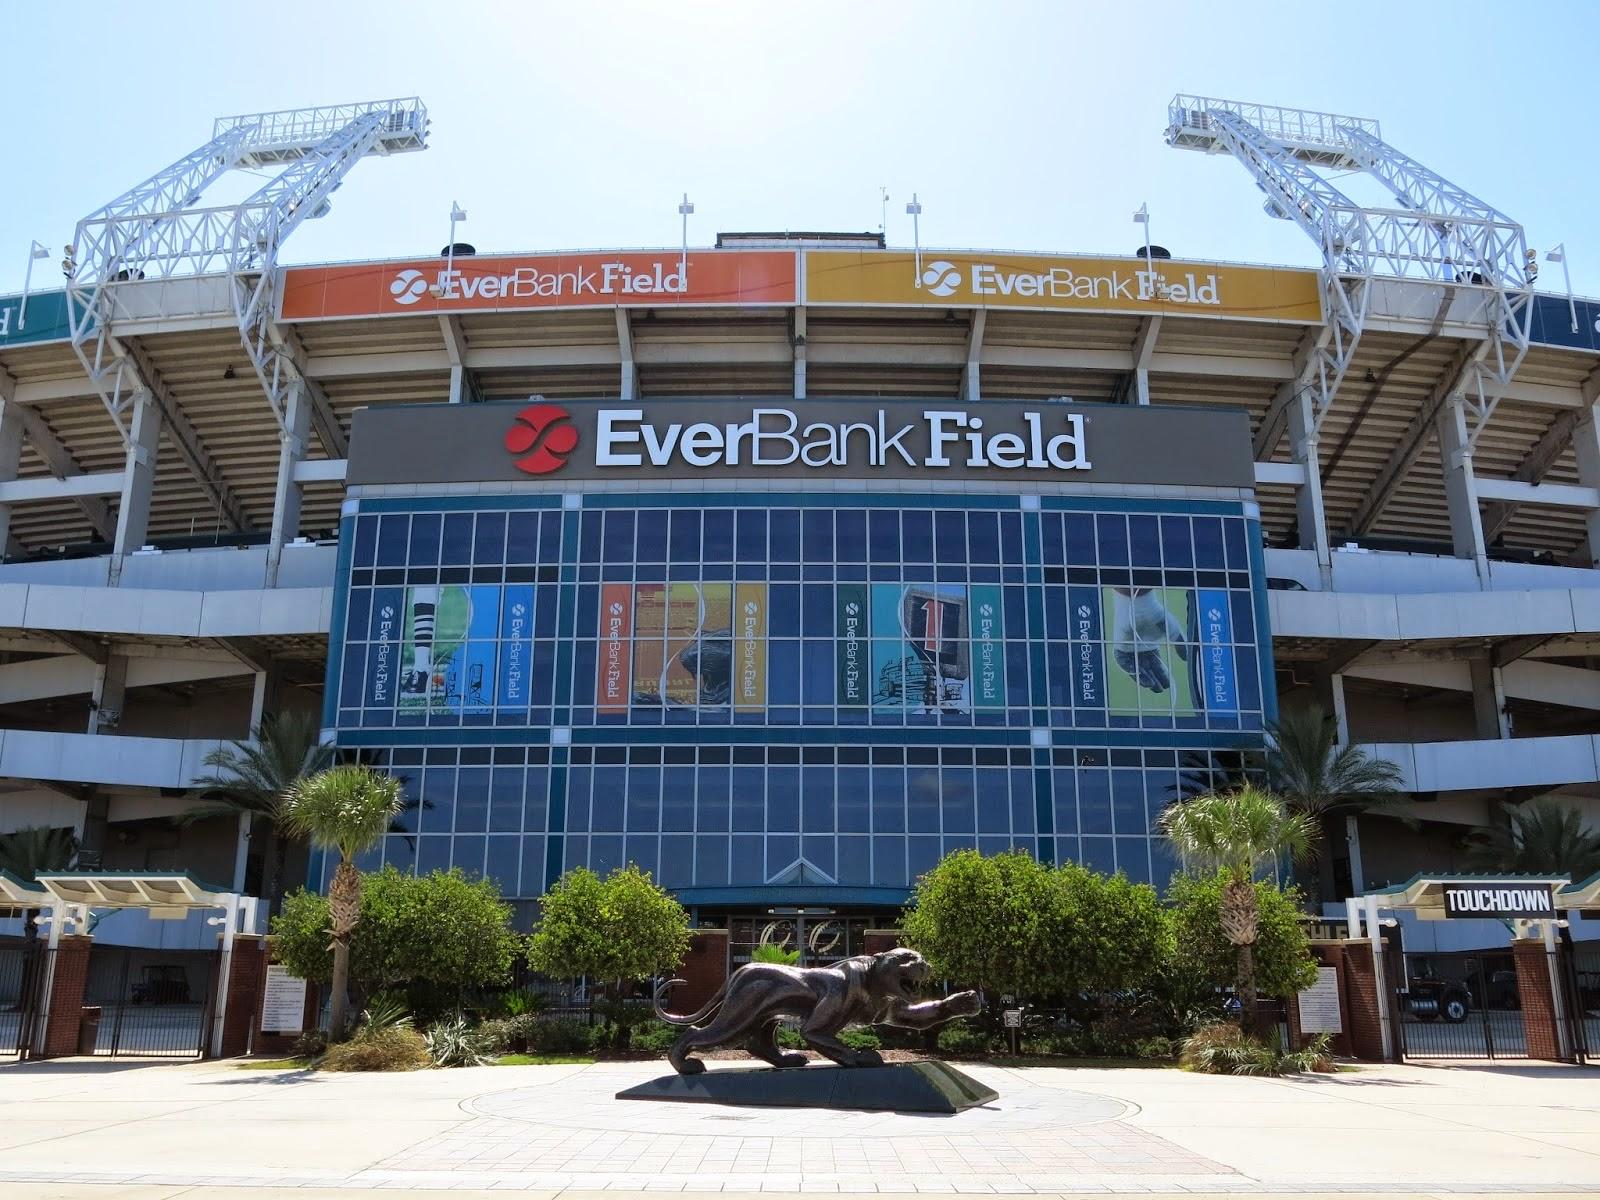 Jacksonville Jaguars Luxury Suites For Sale, EverBank Field